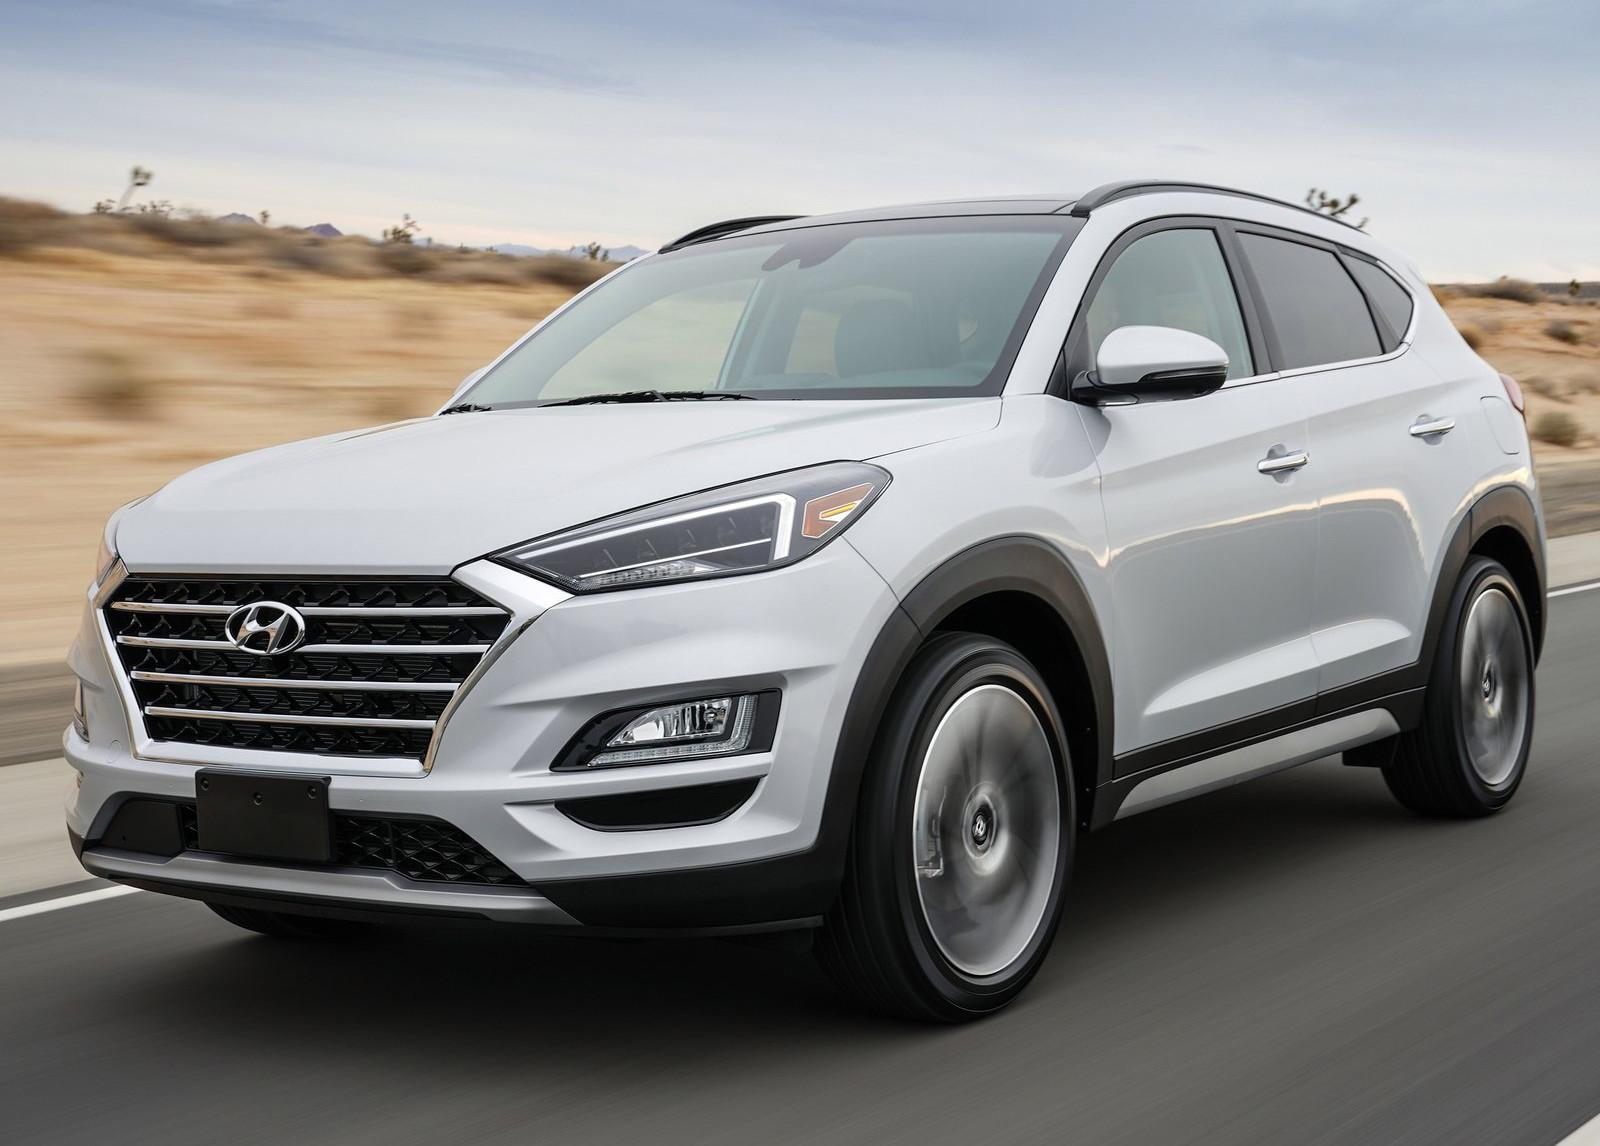 Foto de Hyundai Tucson 2019 (3/9)